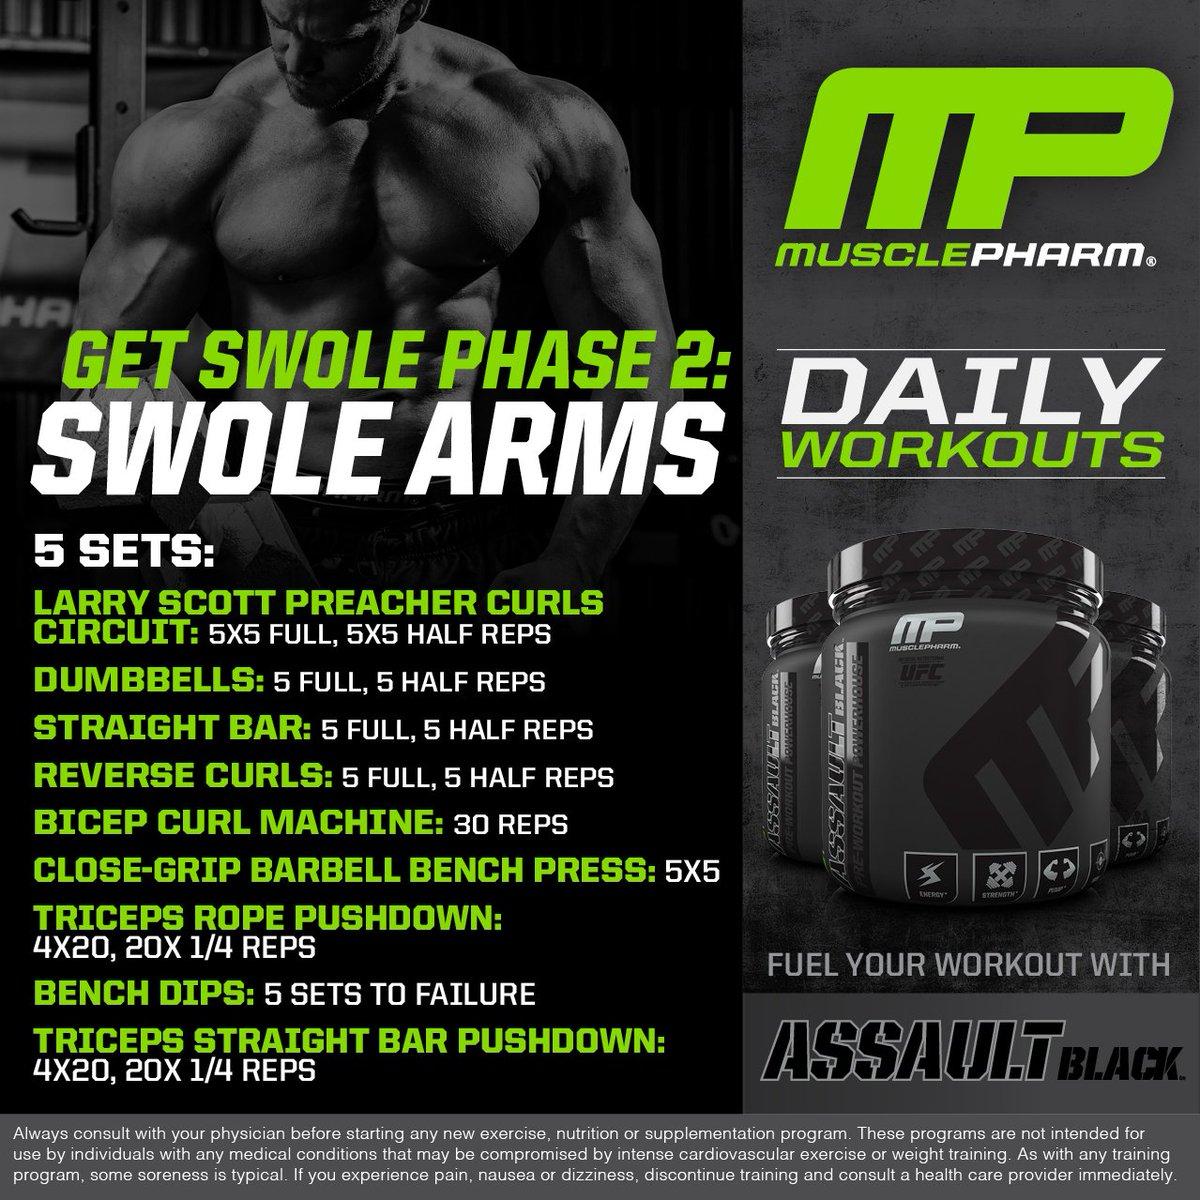 Muscle Pharm Laron Landry Workout Program Yourviewsite Co